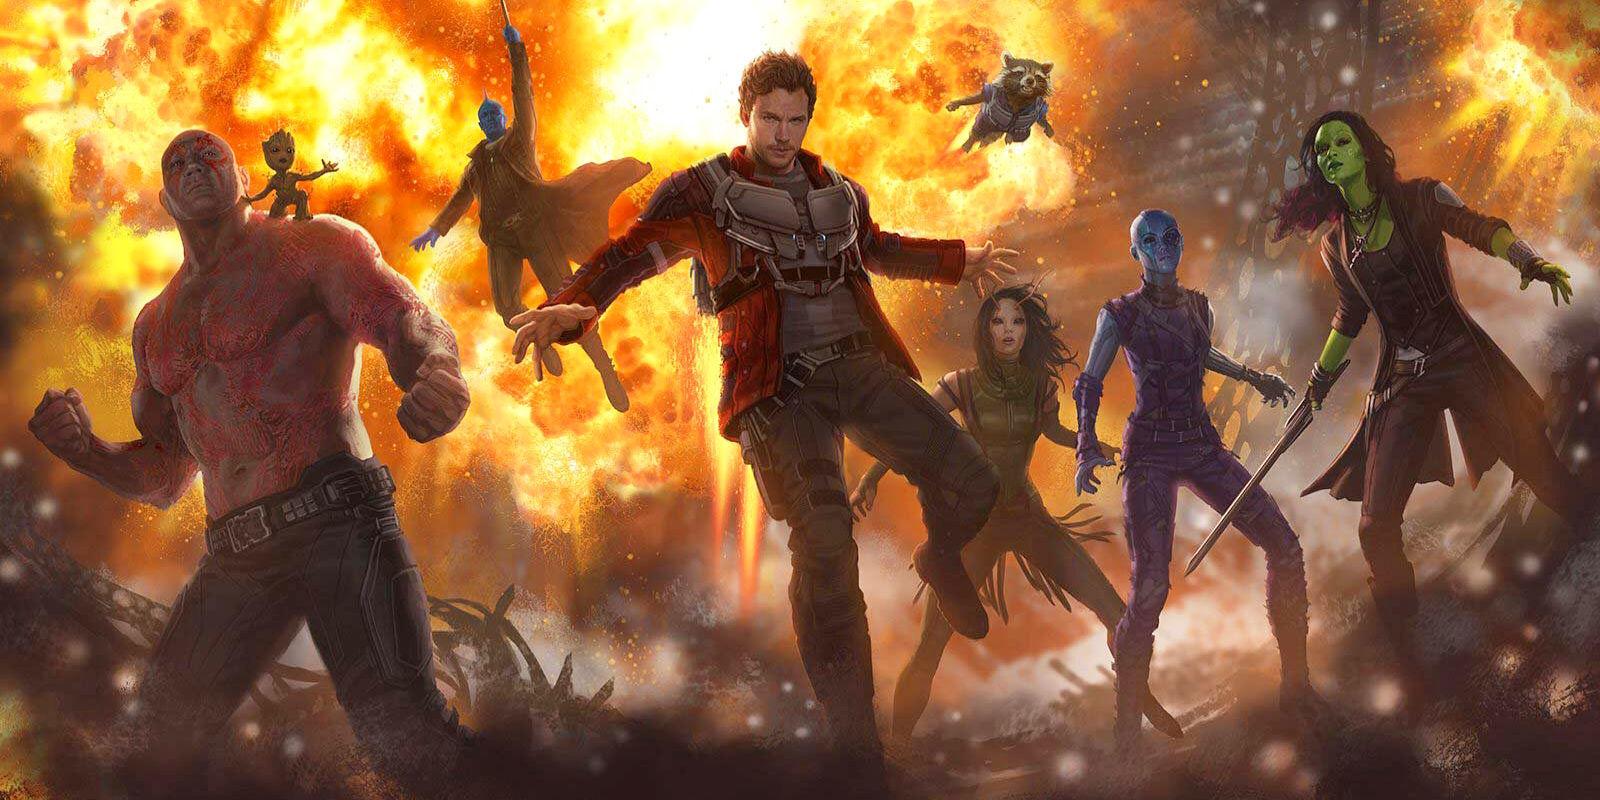 Guardians of the Galaxy Vol 2 Marvel Entertainment Chris Pratt, Zoe Saldana, Dave Bautista, Bradley Cooper, Michael Rooker